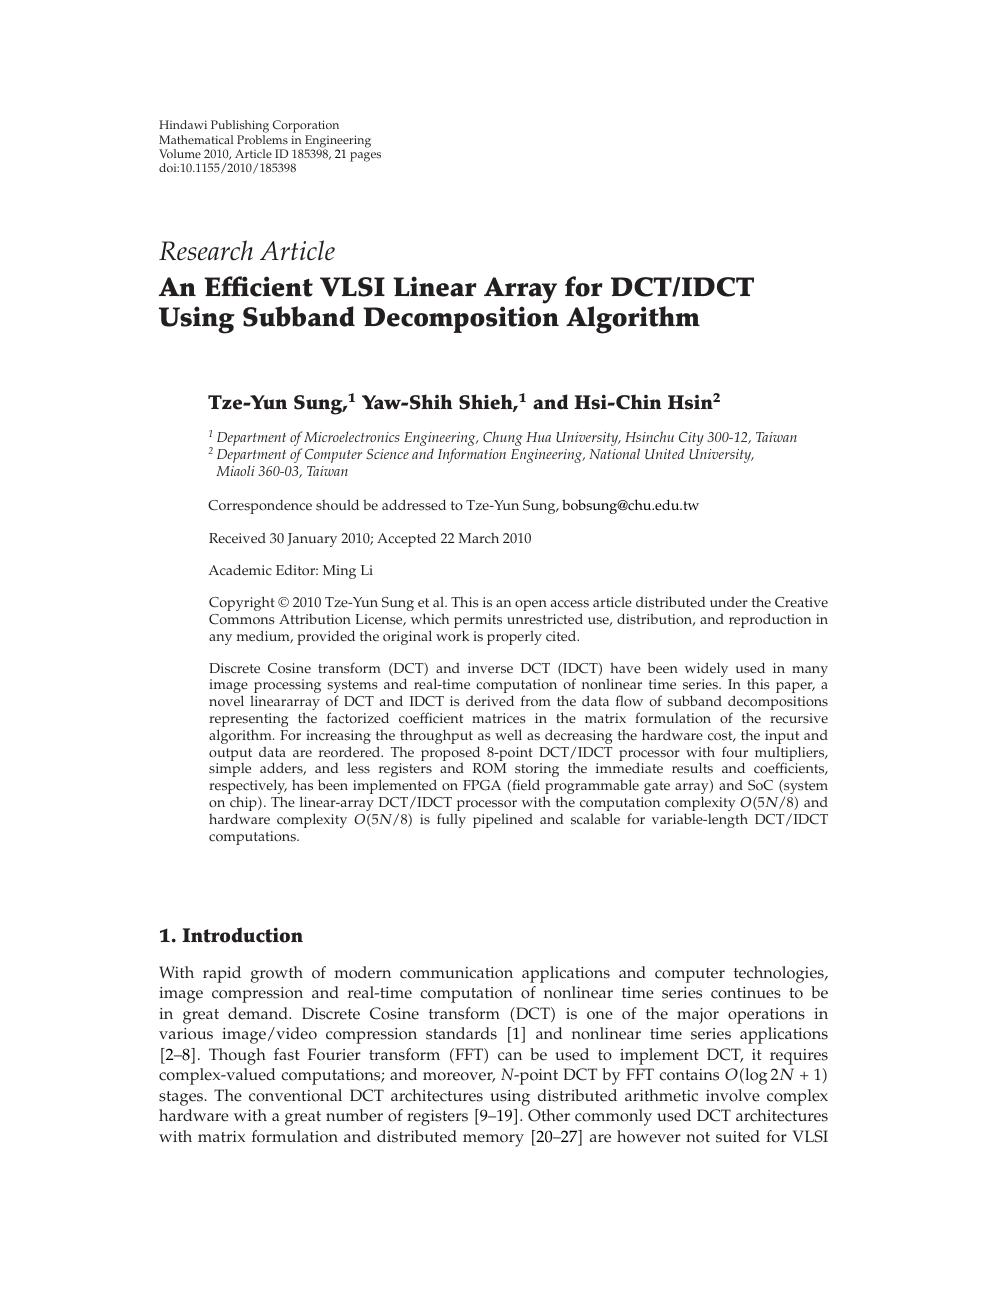 An Efficient VLSI Linear Array for DCT/IDCT Using Subband